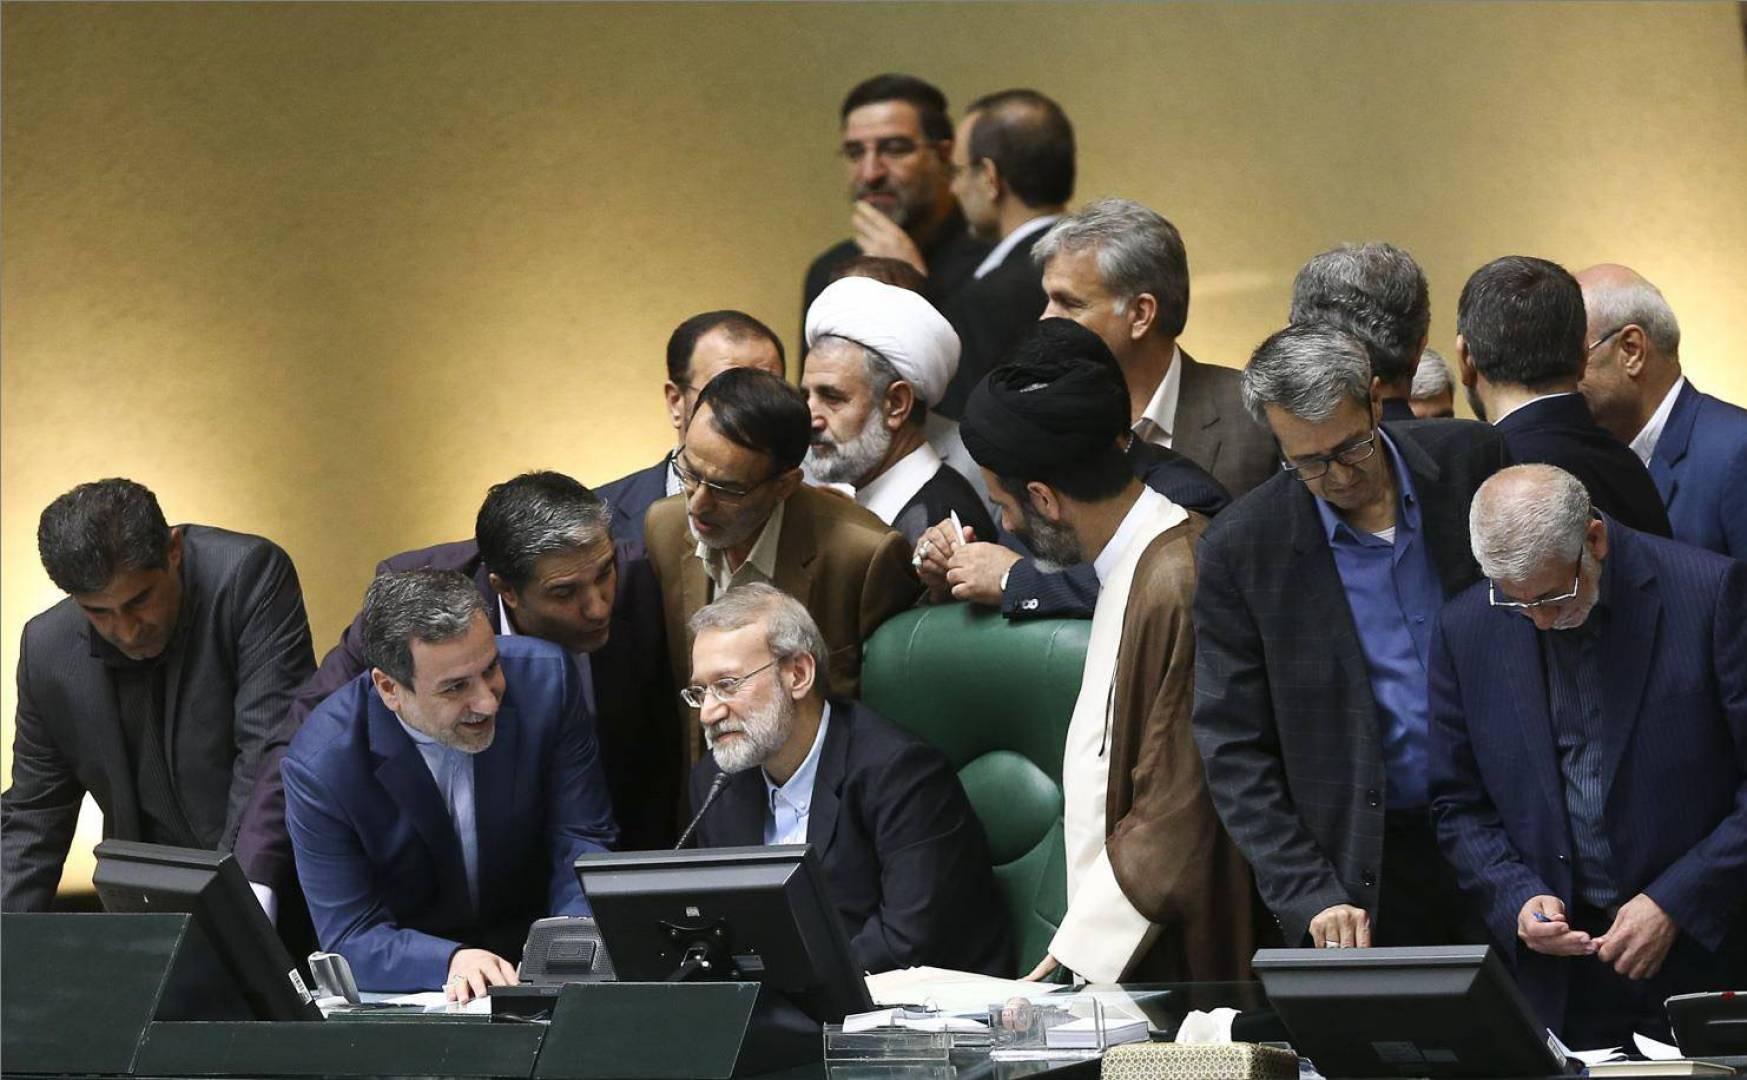 إيران لا تستطيع انتظار أوروبا